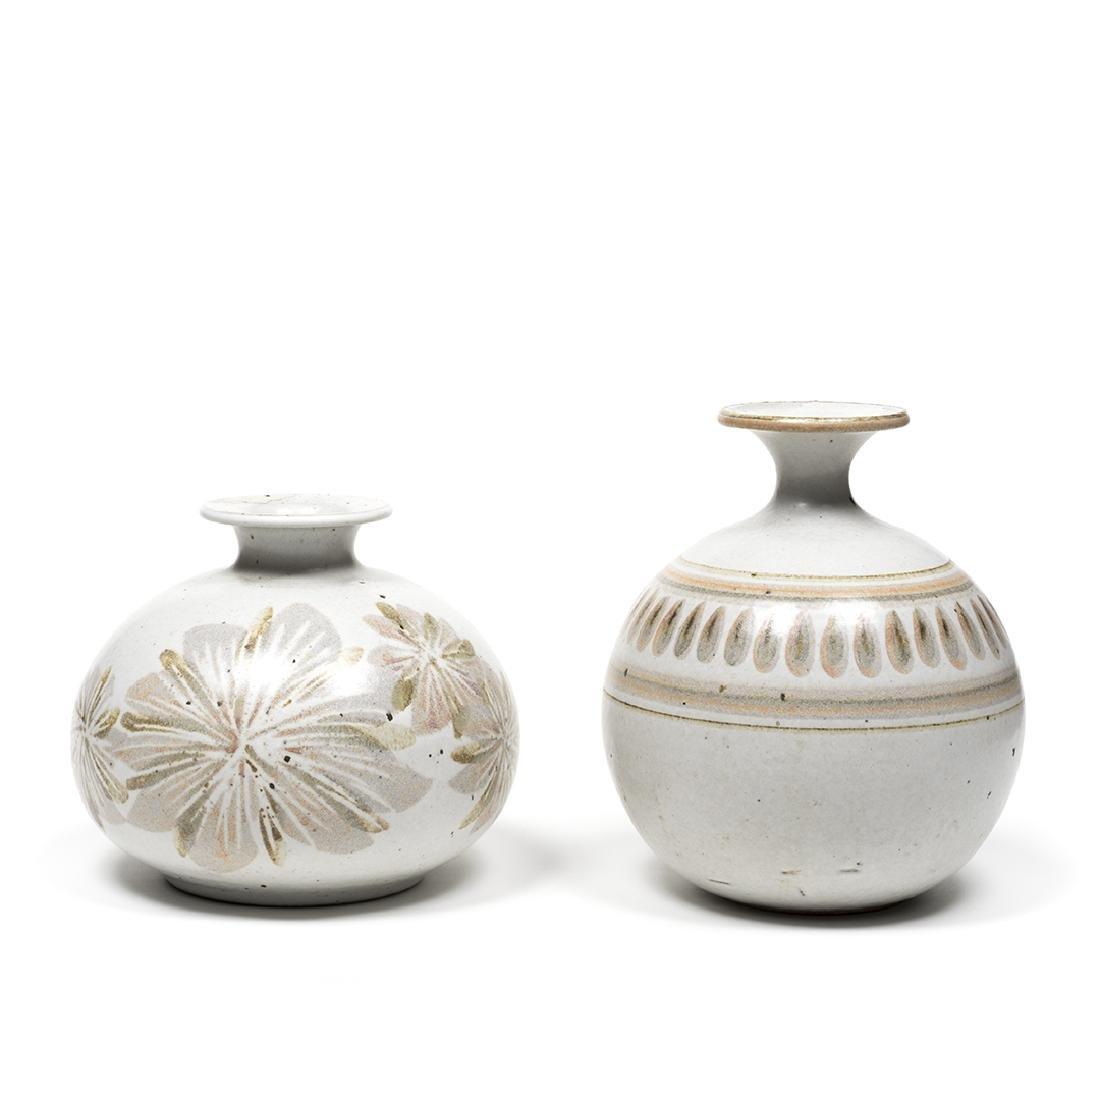 Robert Maxwell Vases (2)